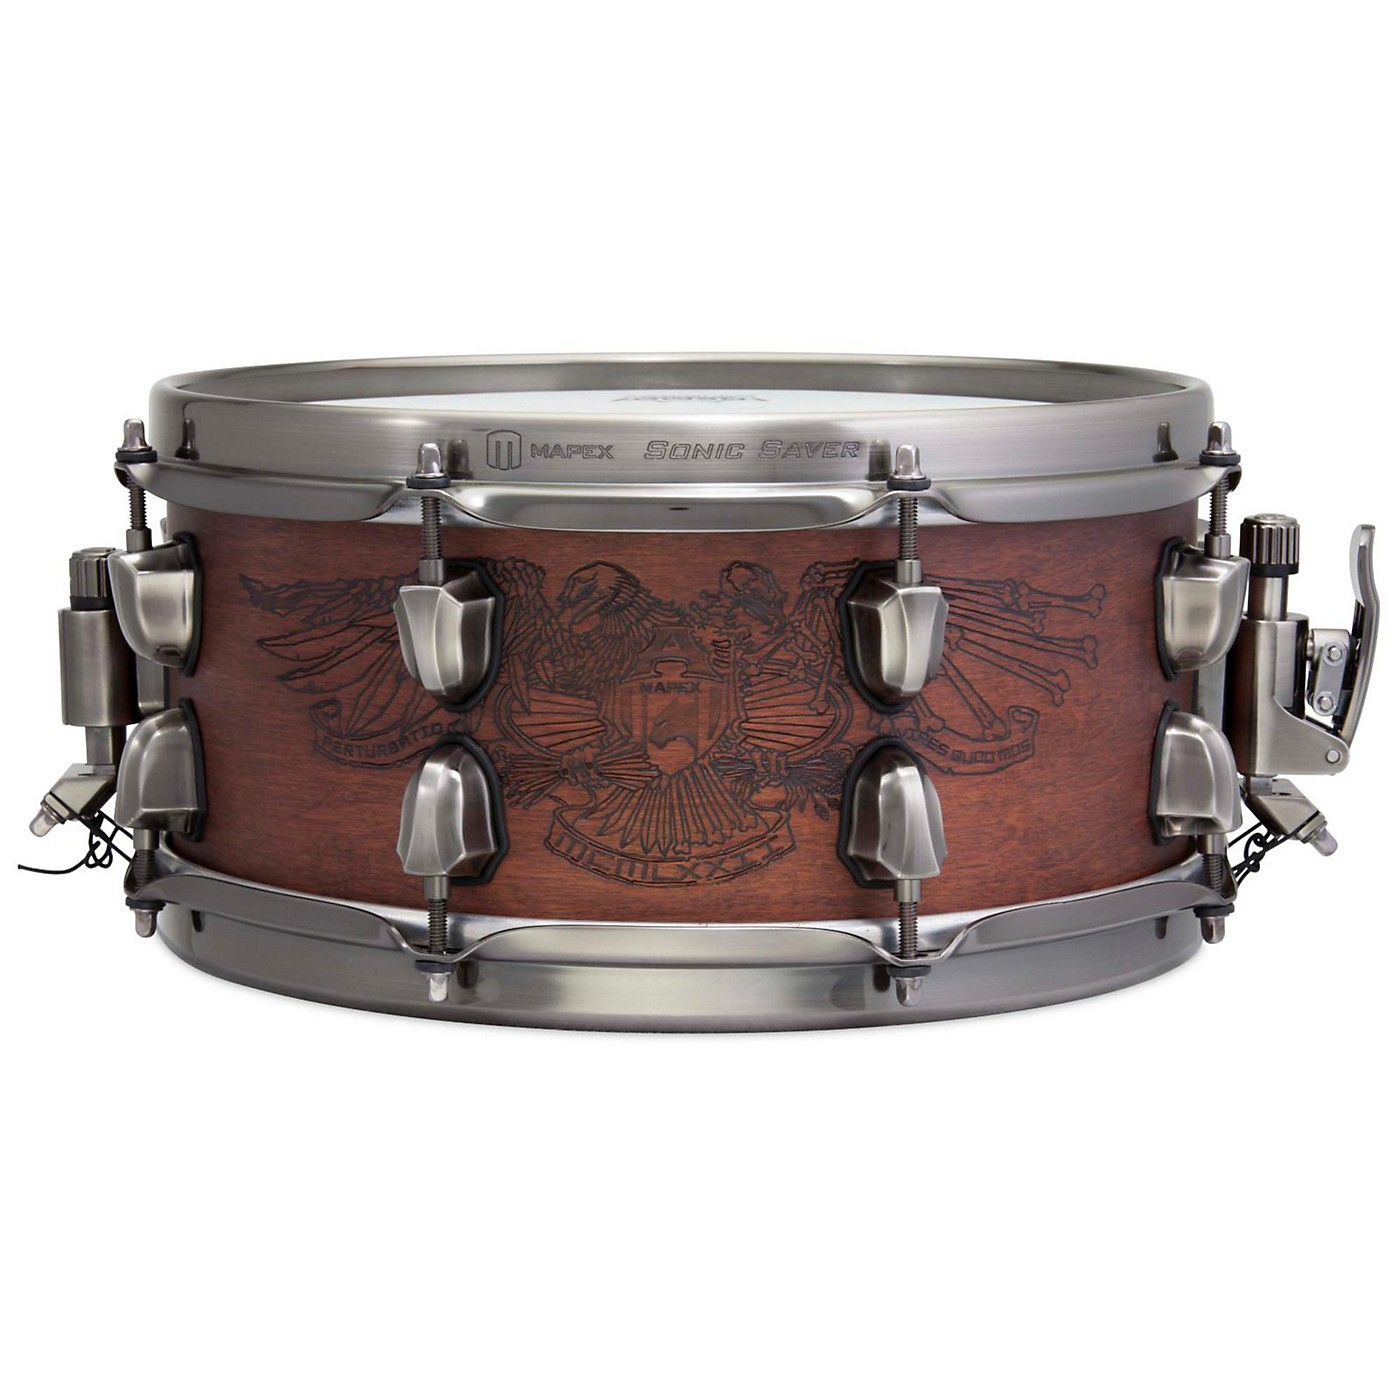 Mapex Warbird Chris Adler Artist Inspired Black Panther Snare Drum thumbnail